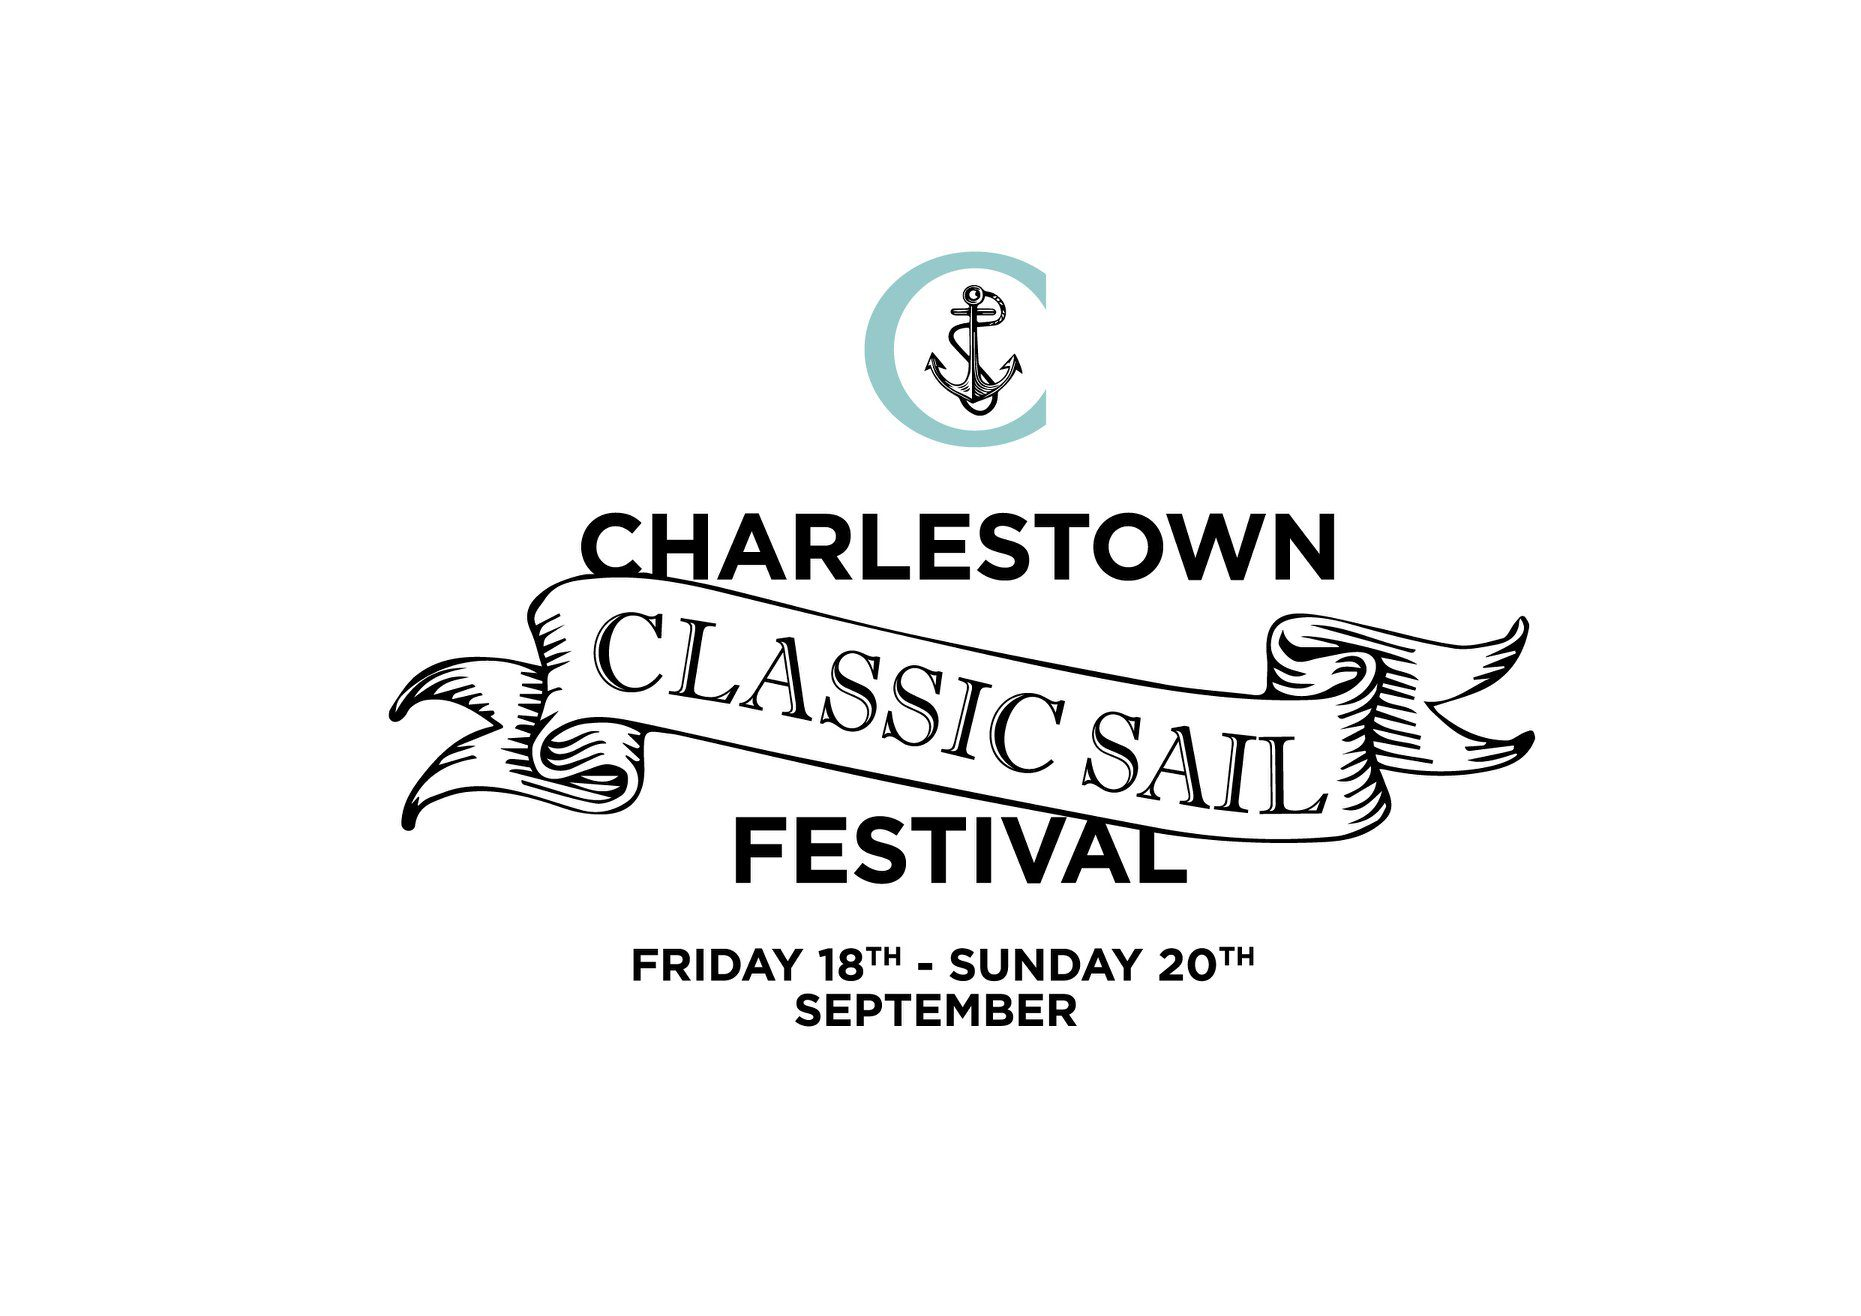 POSTPONED – Charlestown Classic Sail Festival 2020